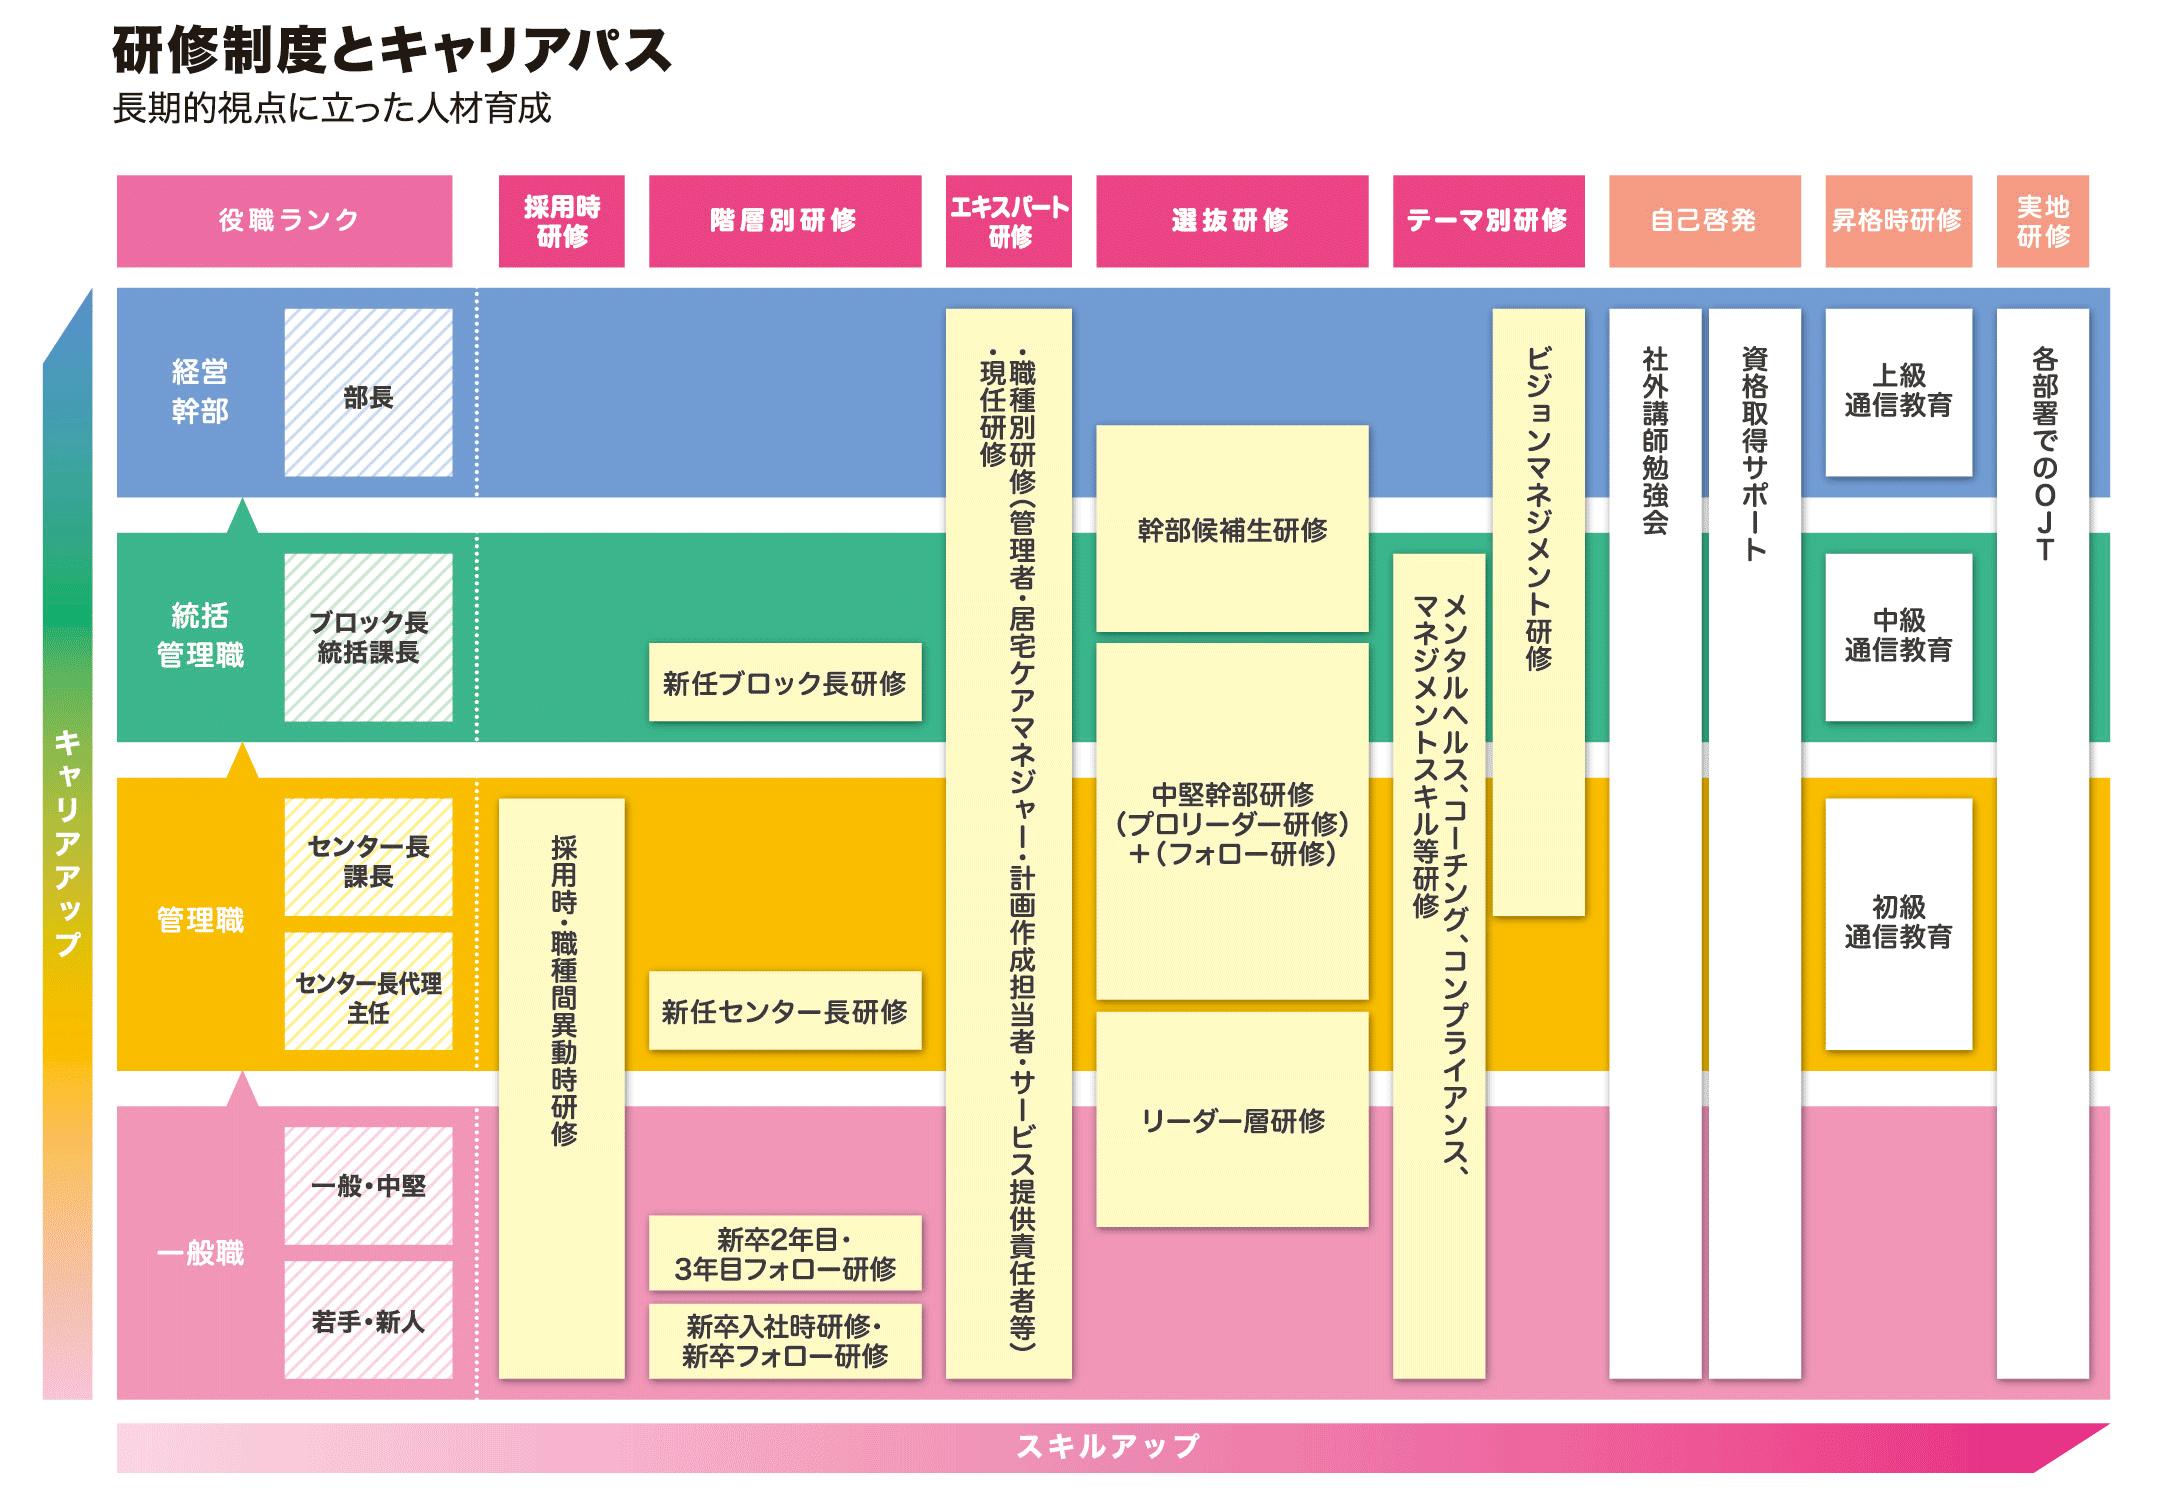 http://hint-hiroshima.com/keiei/upload/type2_sankiwellbe_6.png